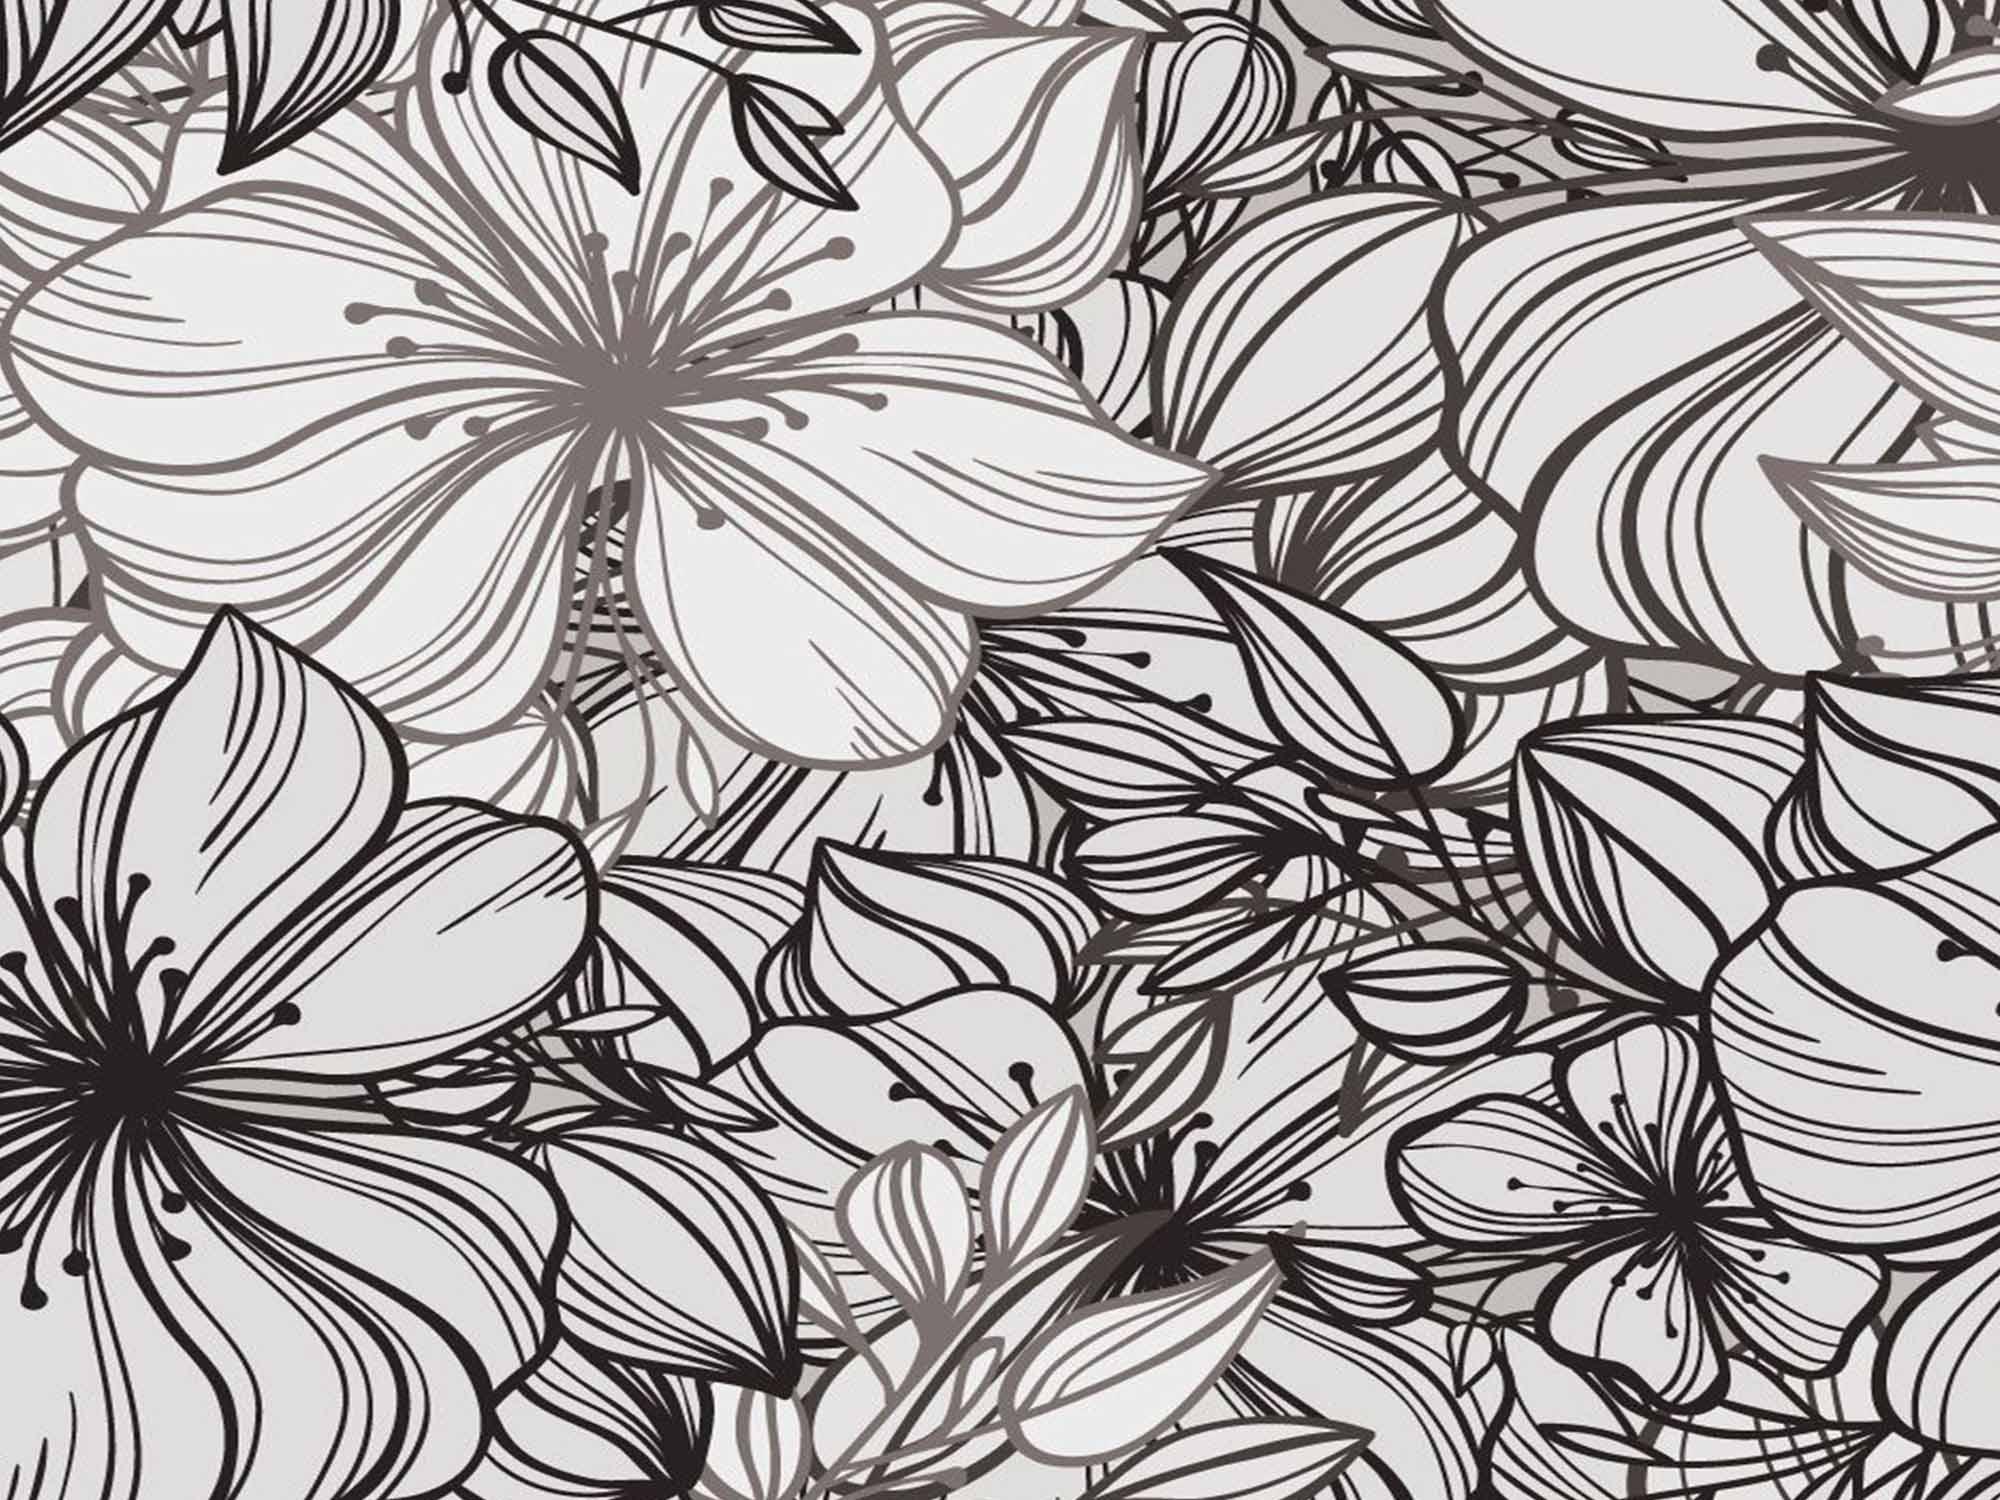 Papel de Parede Floral 0087 - Adesivos de Parede  - Paredes Decoradas